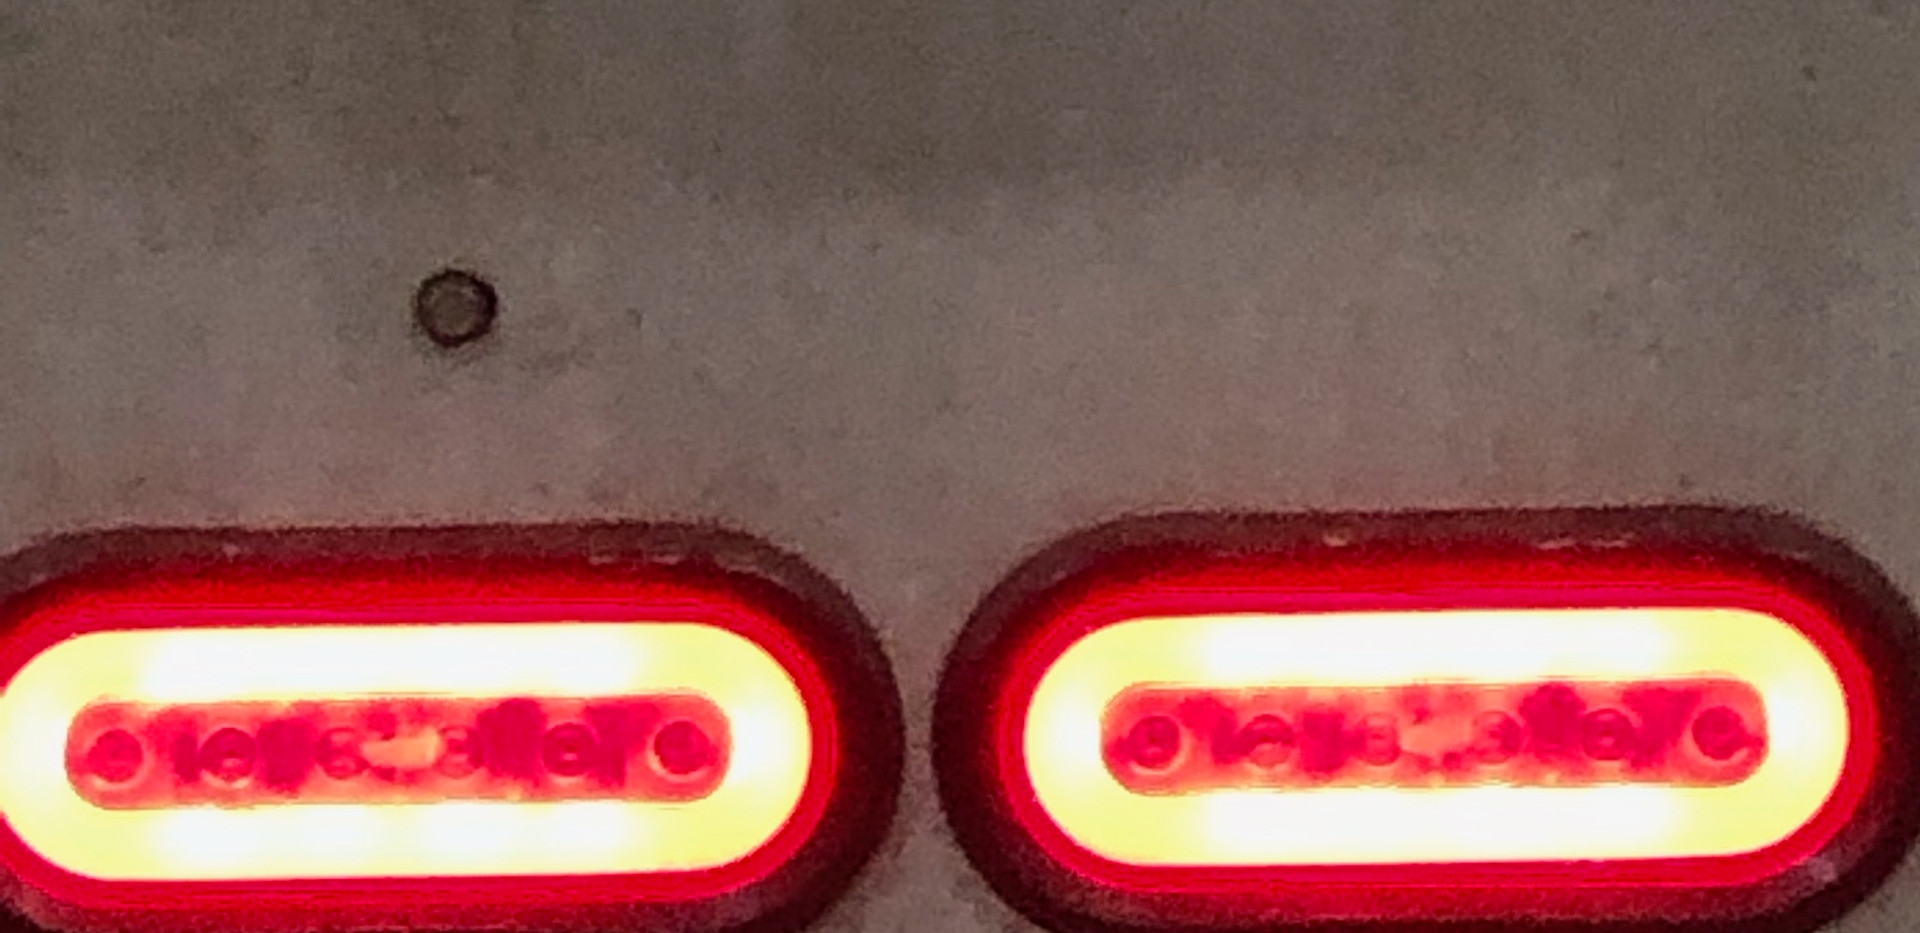 LED Tail Lamp Conversion